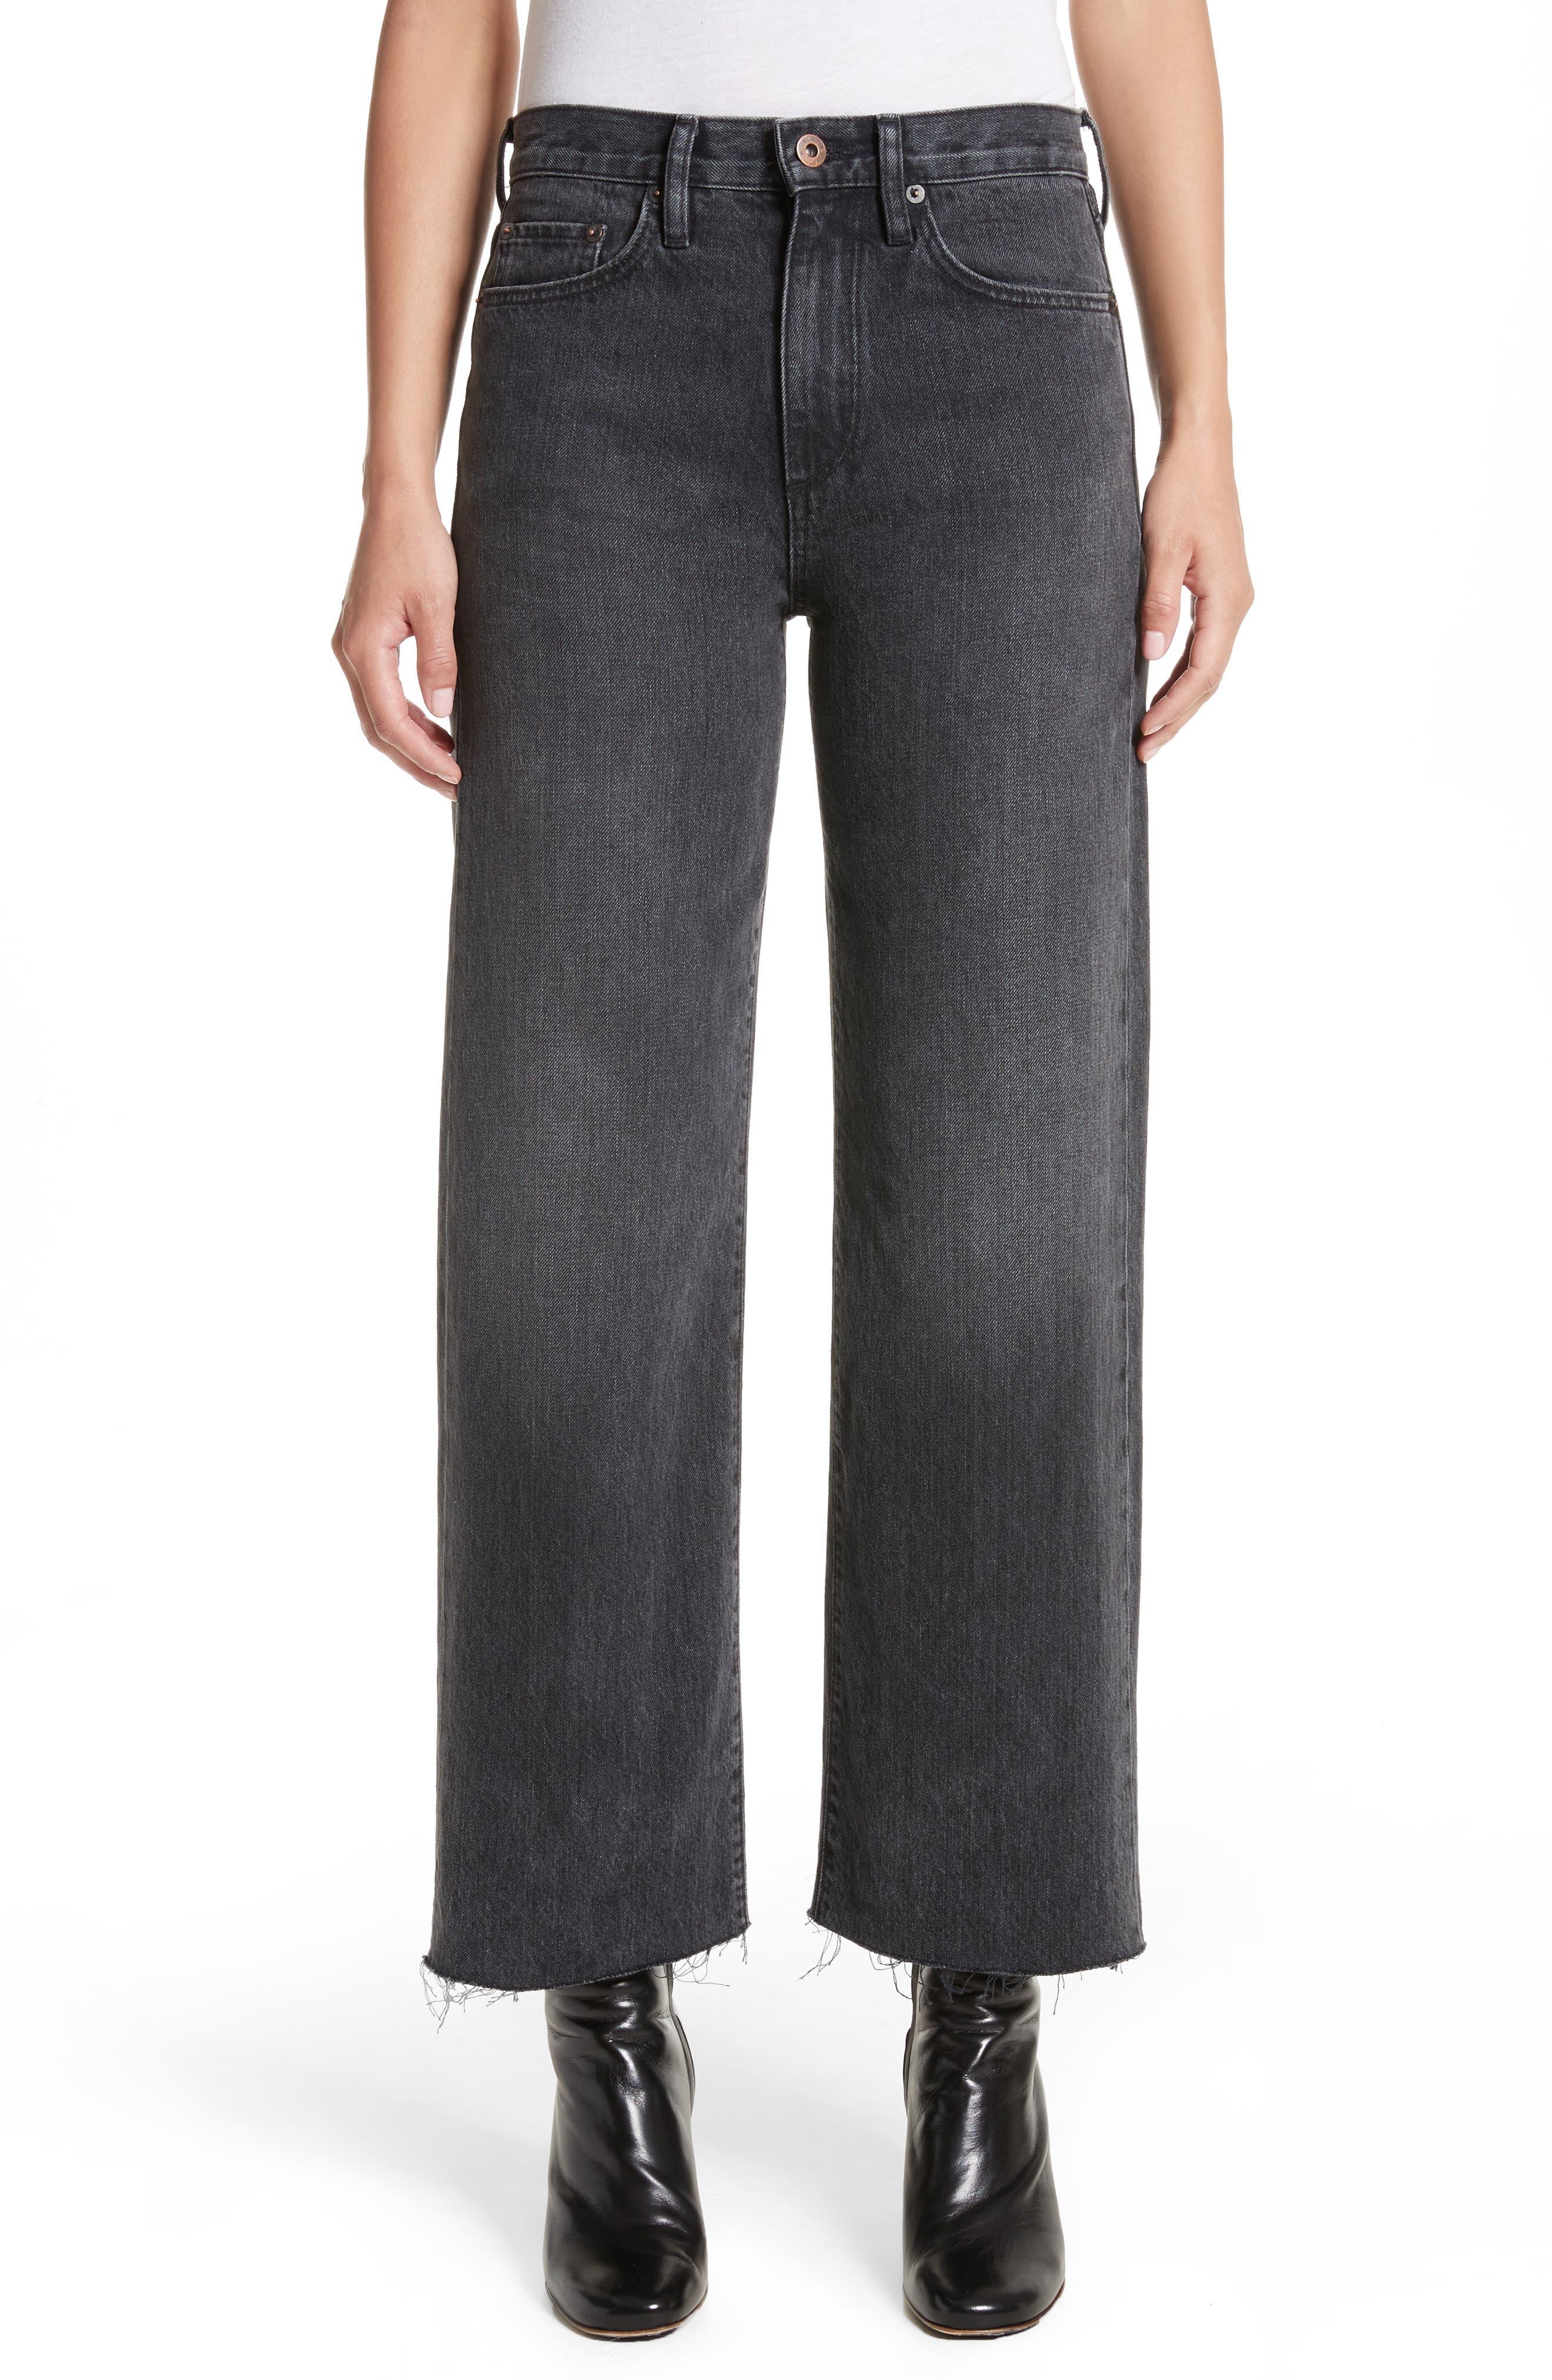 Tilson Crop Frayed Wide Leg Jeans,                         Main,                         color, 001